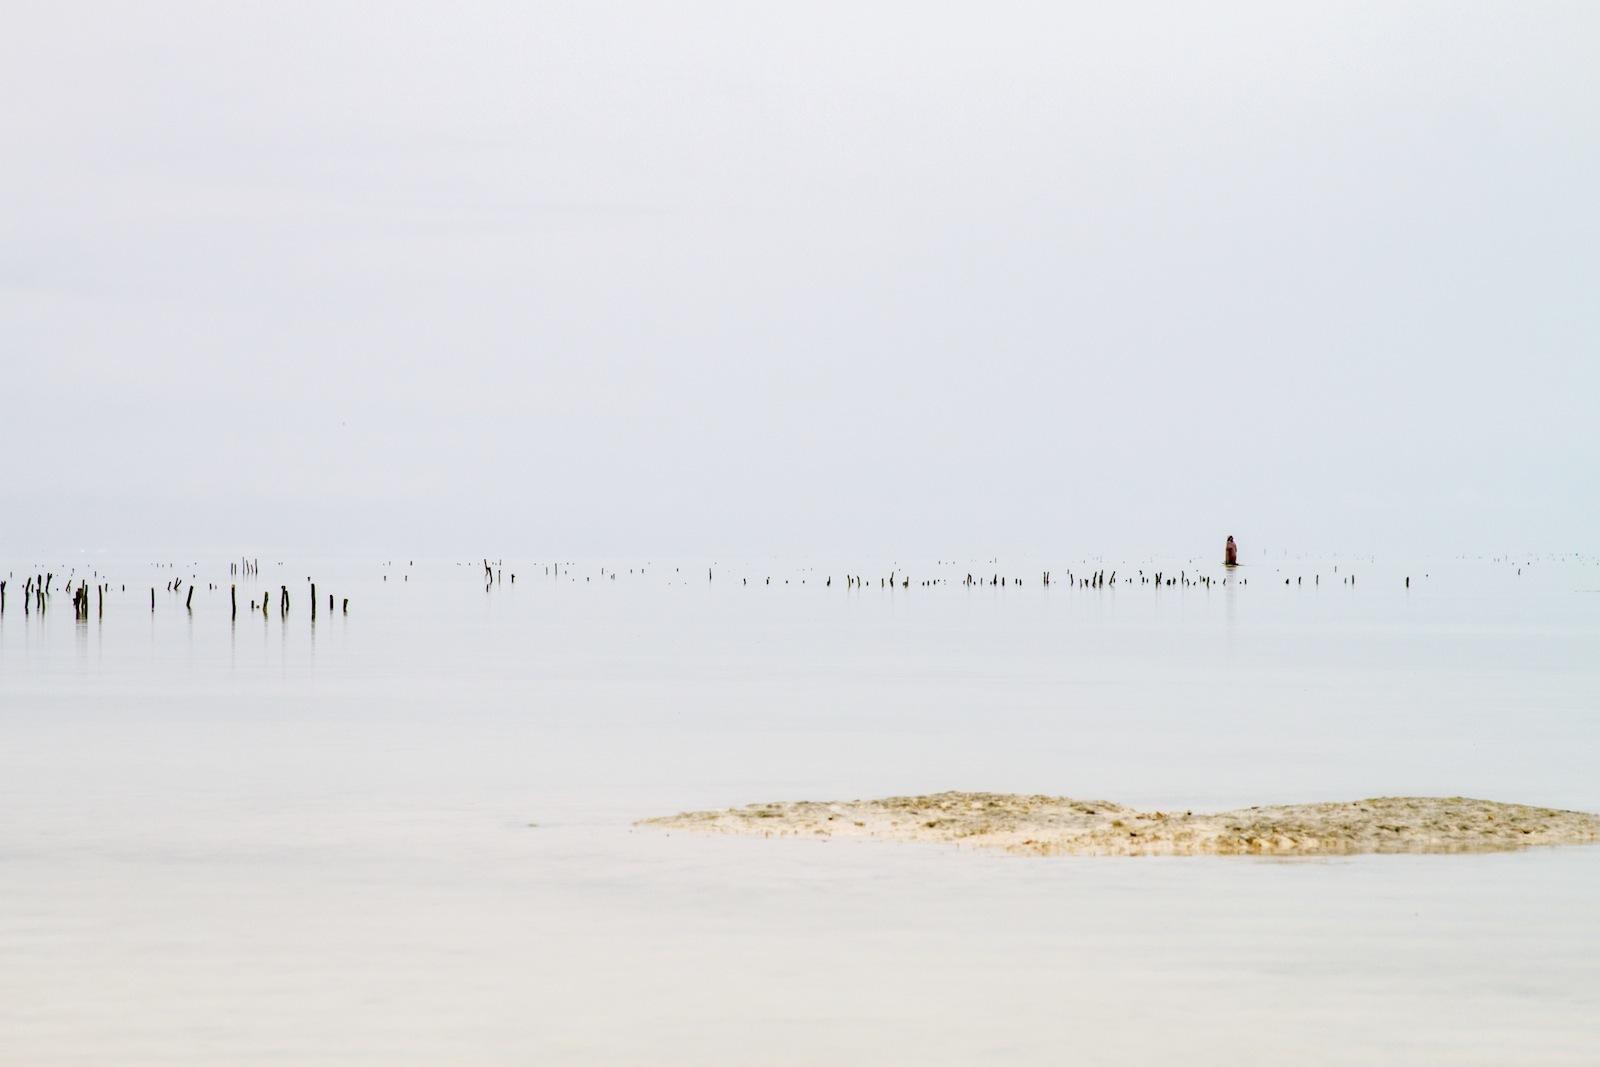 Granjeras de algas en el Índico (Zanzíbar [Tanzania]) Zanzibar3